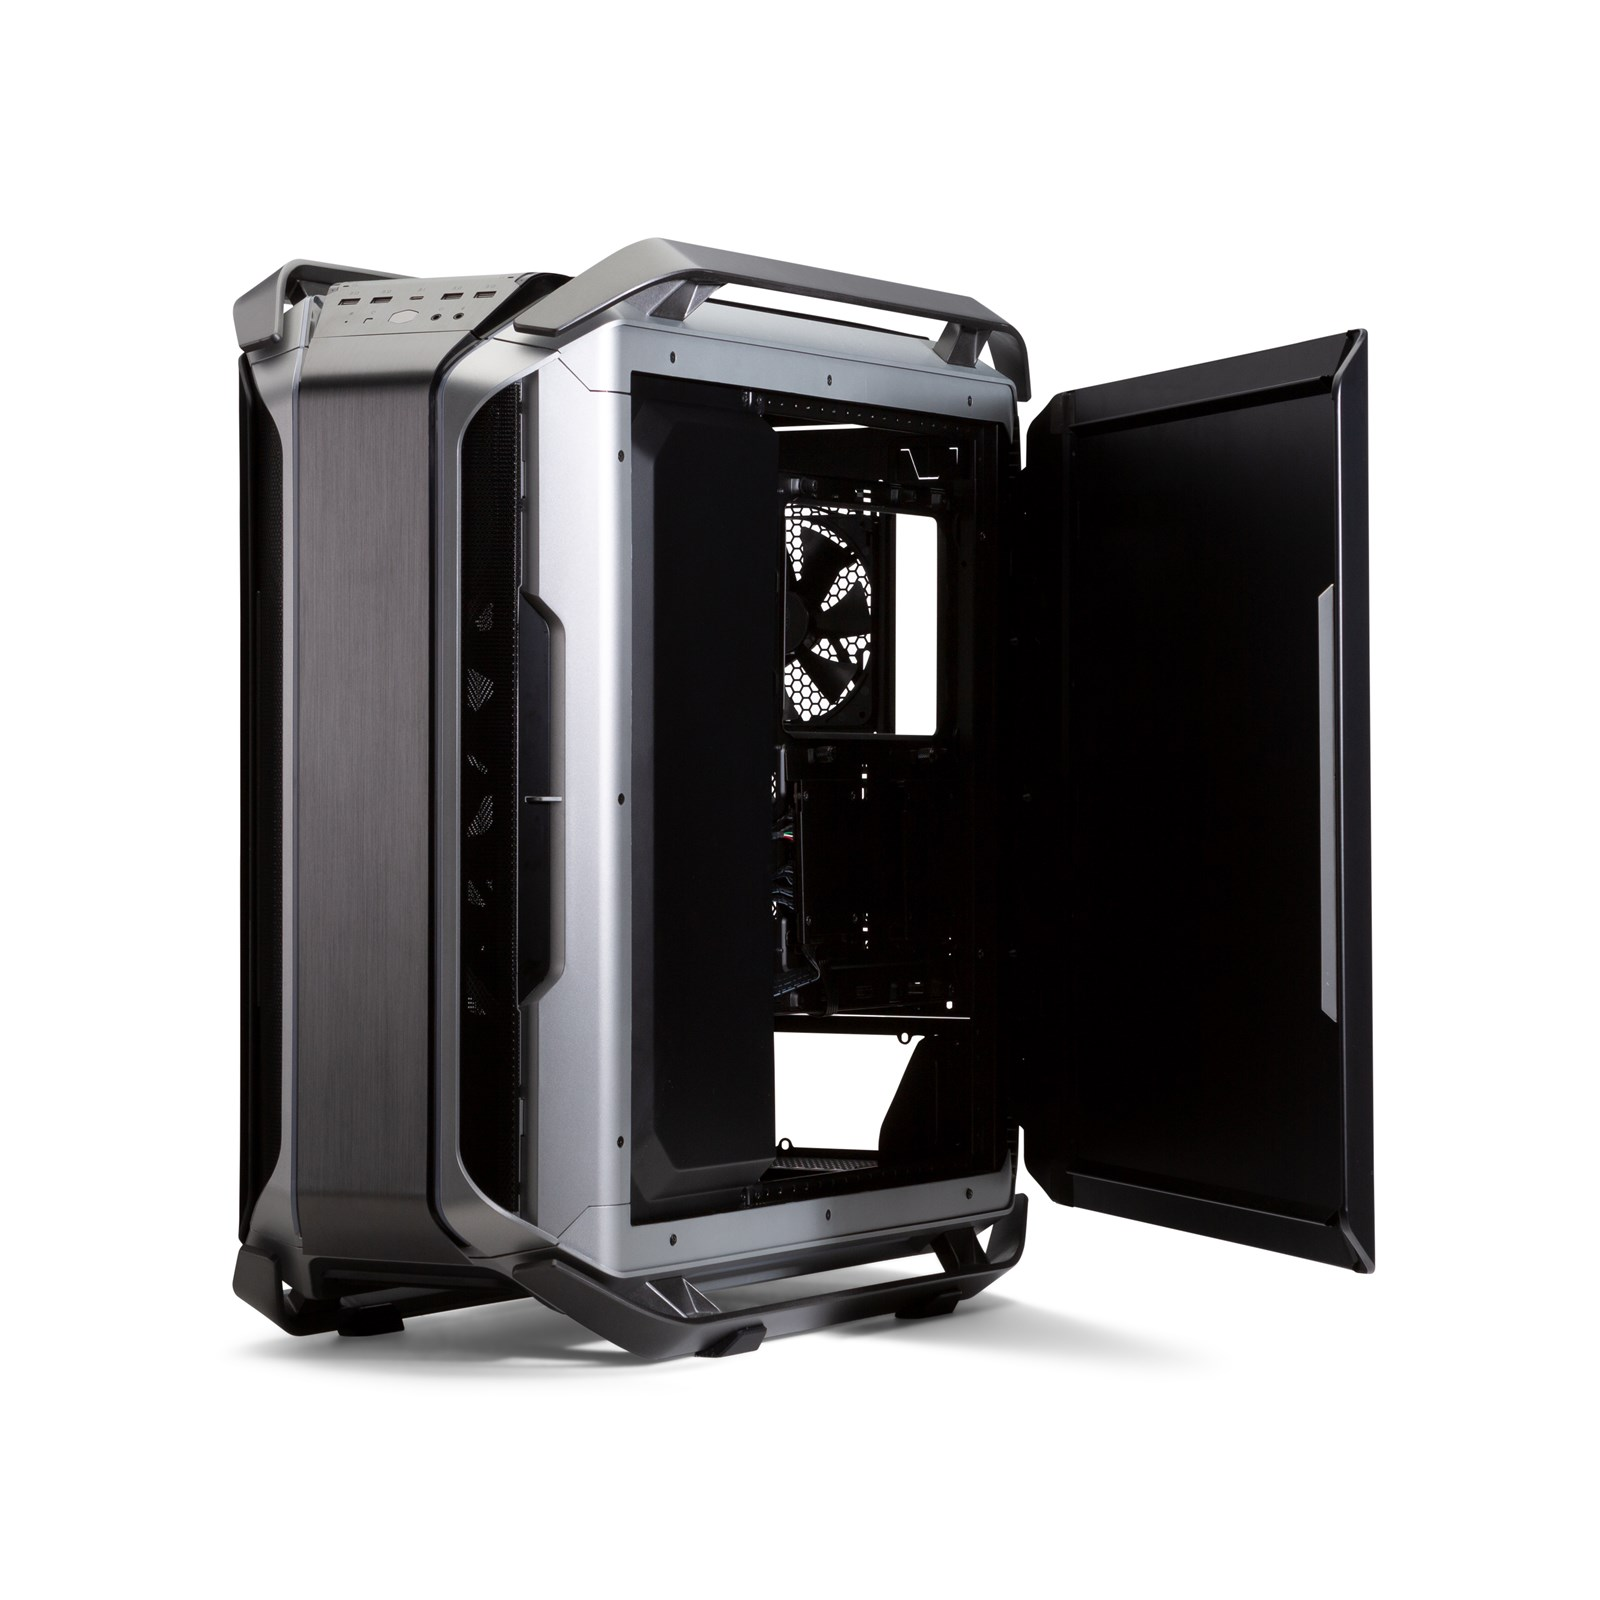 Gabinete Cosmos C700M - Vidro Temperado - Iluminacao RGB - MCC-C700M-MG5N-S00